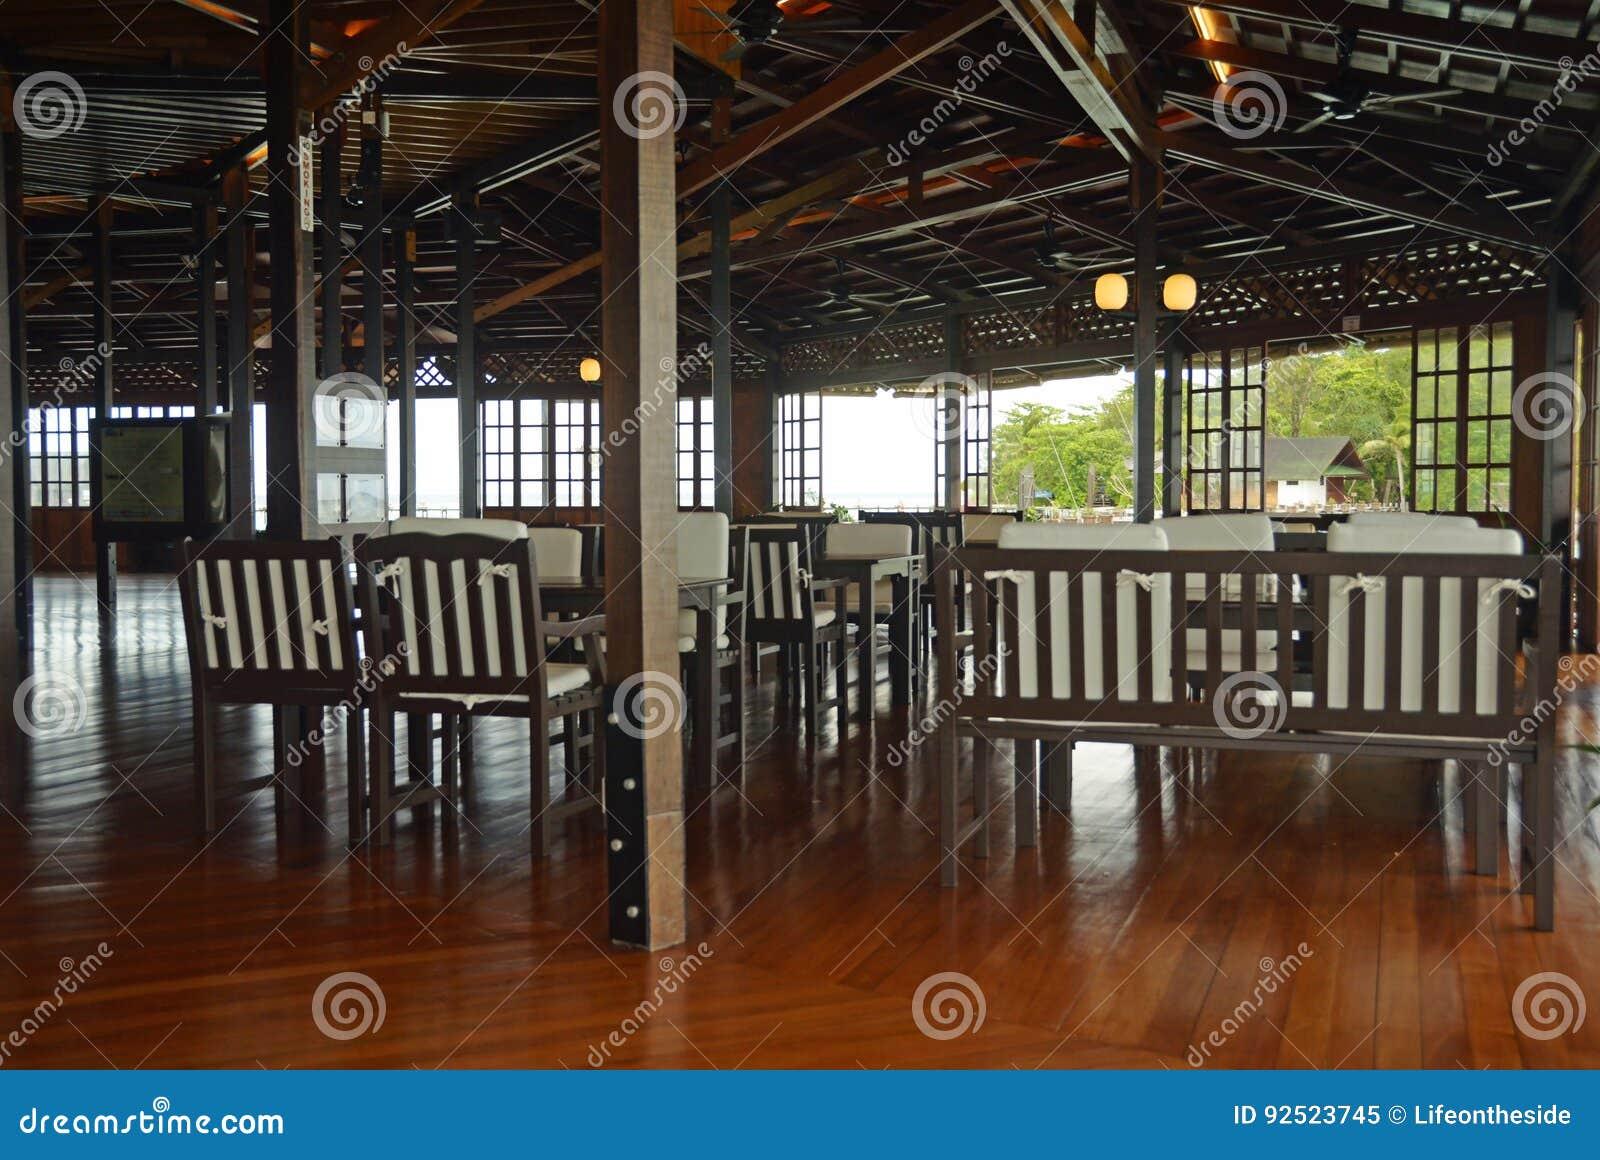 Interior Decor Of Luxury Tropical Island Resort Restaurant Stock Image Image Of Borneo Floors 92523745